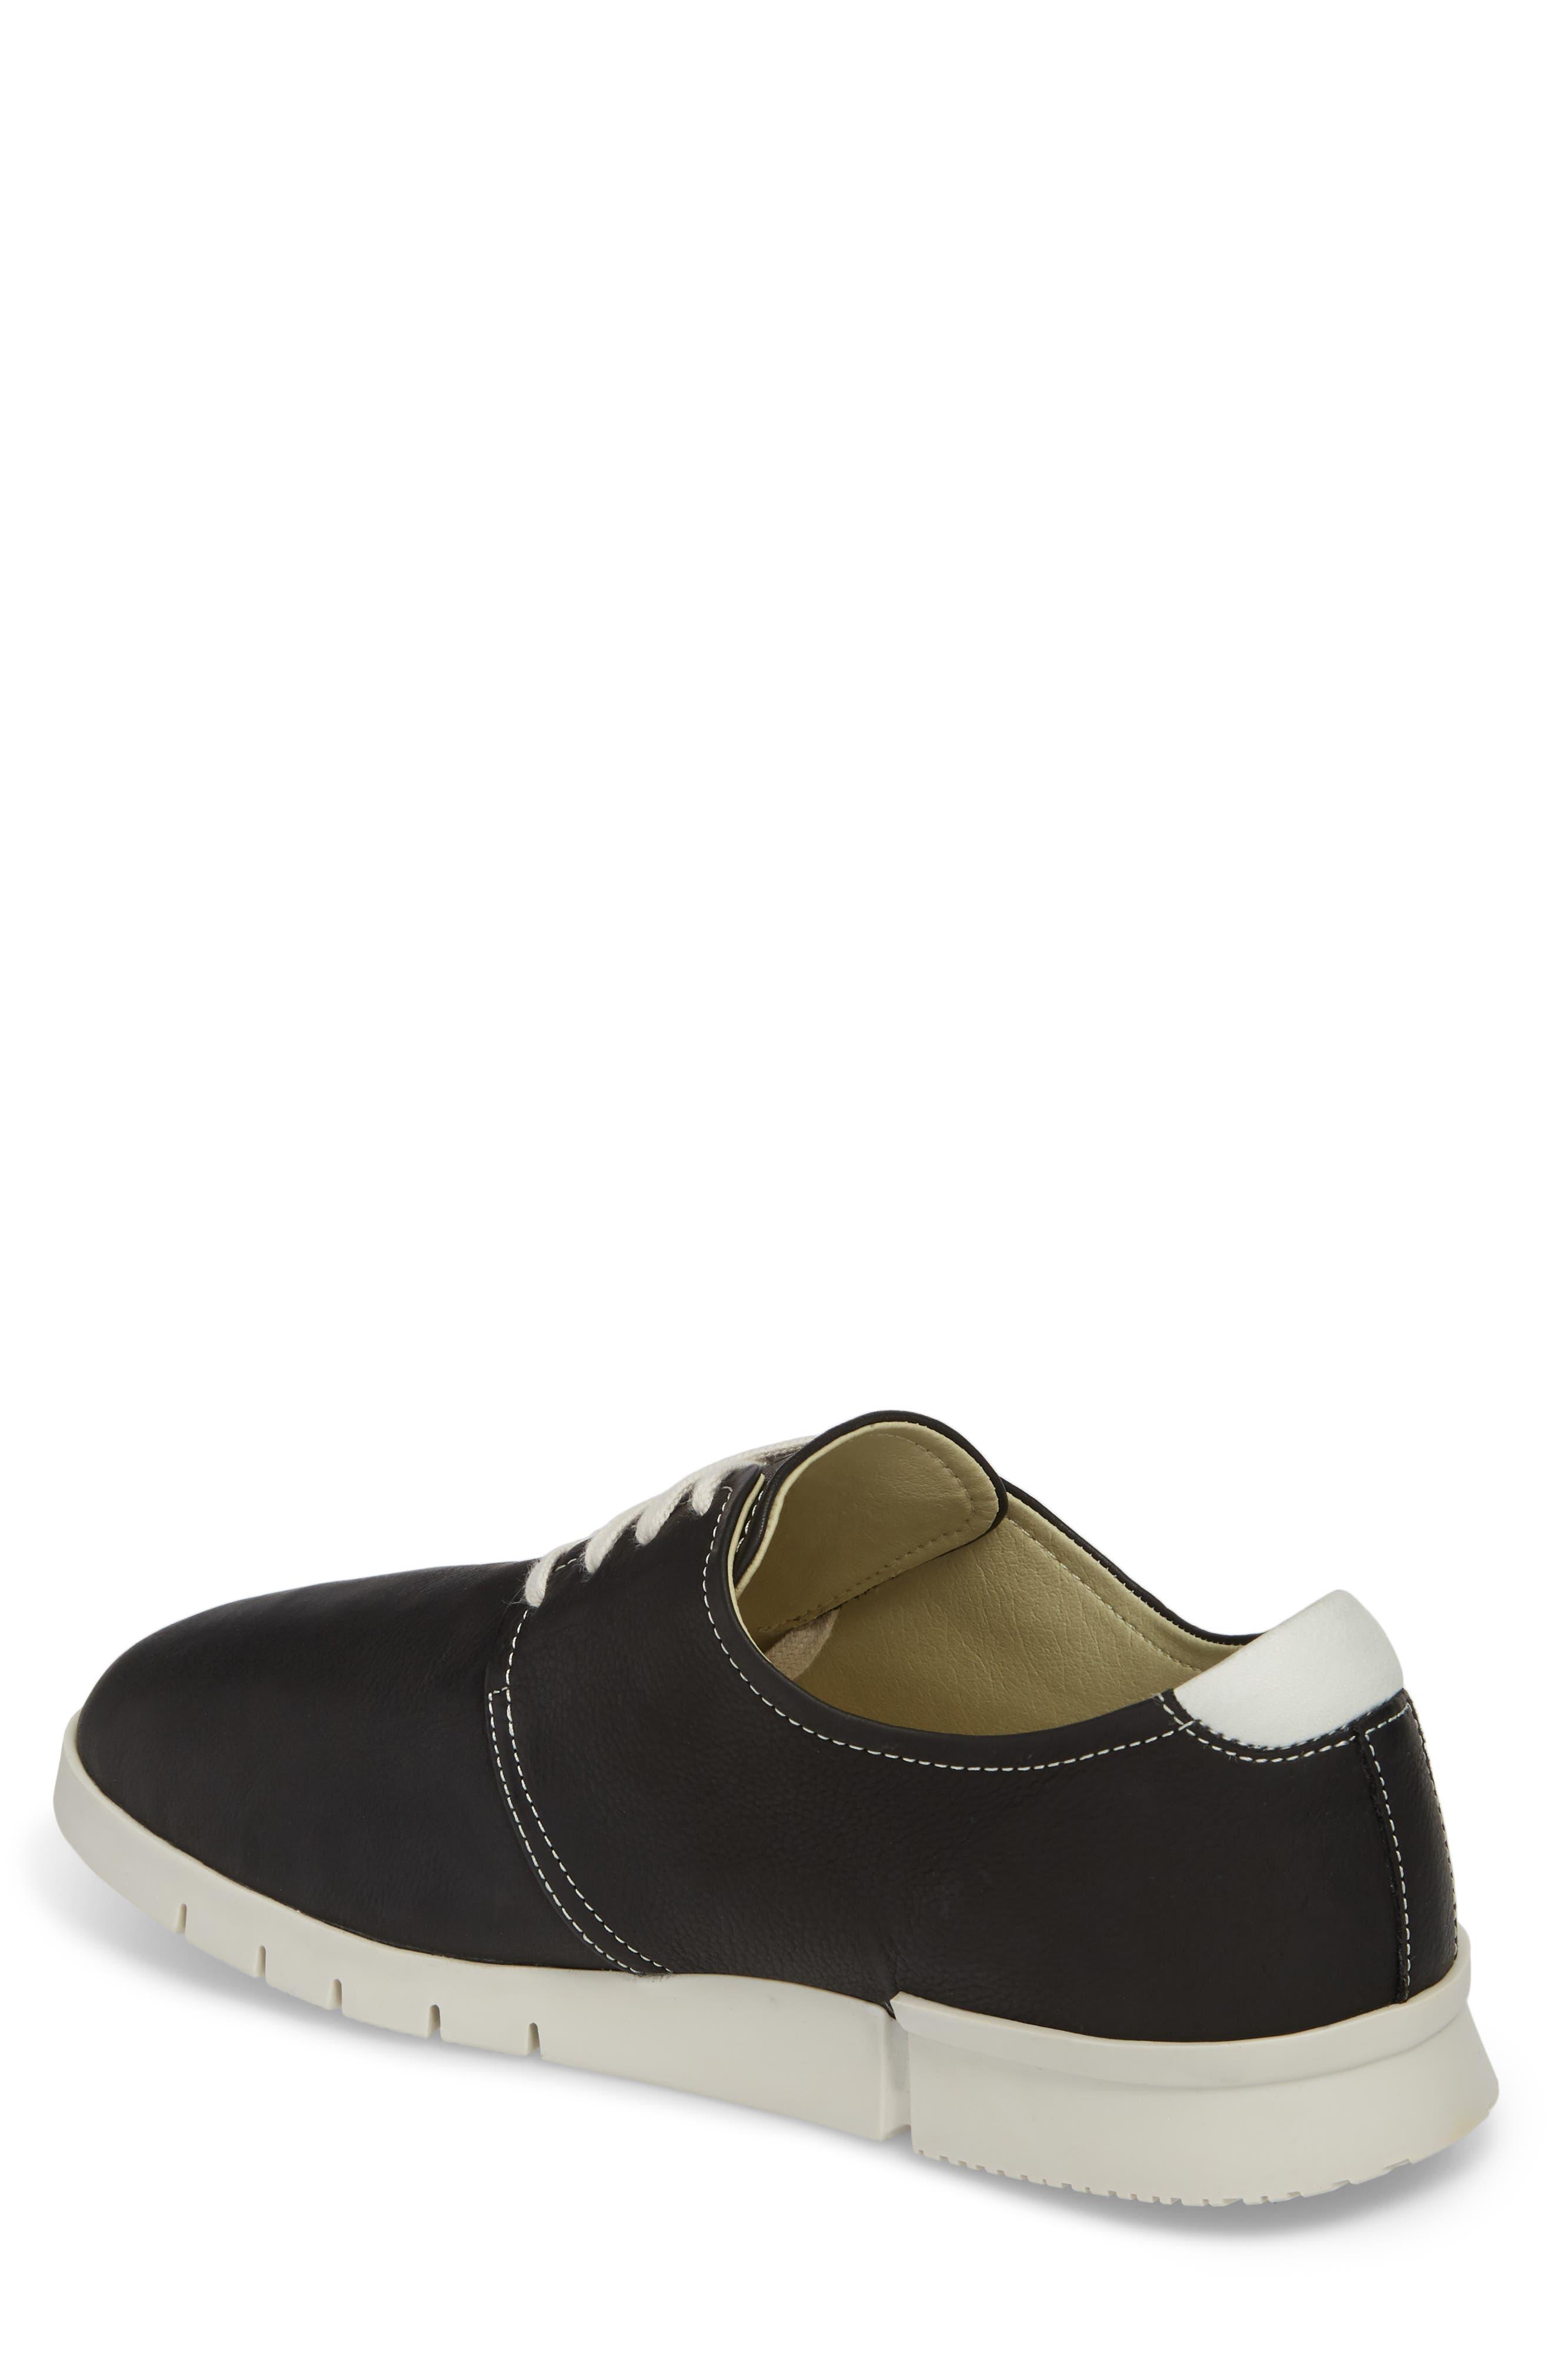 Alternate Image 2  - Softinos by Fly London Cap Low Top Sneaker (Men)